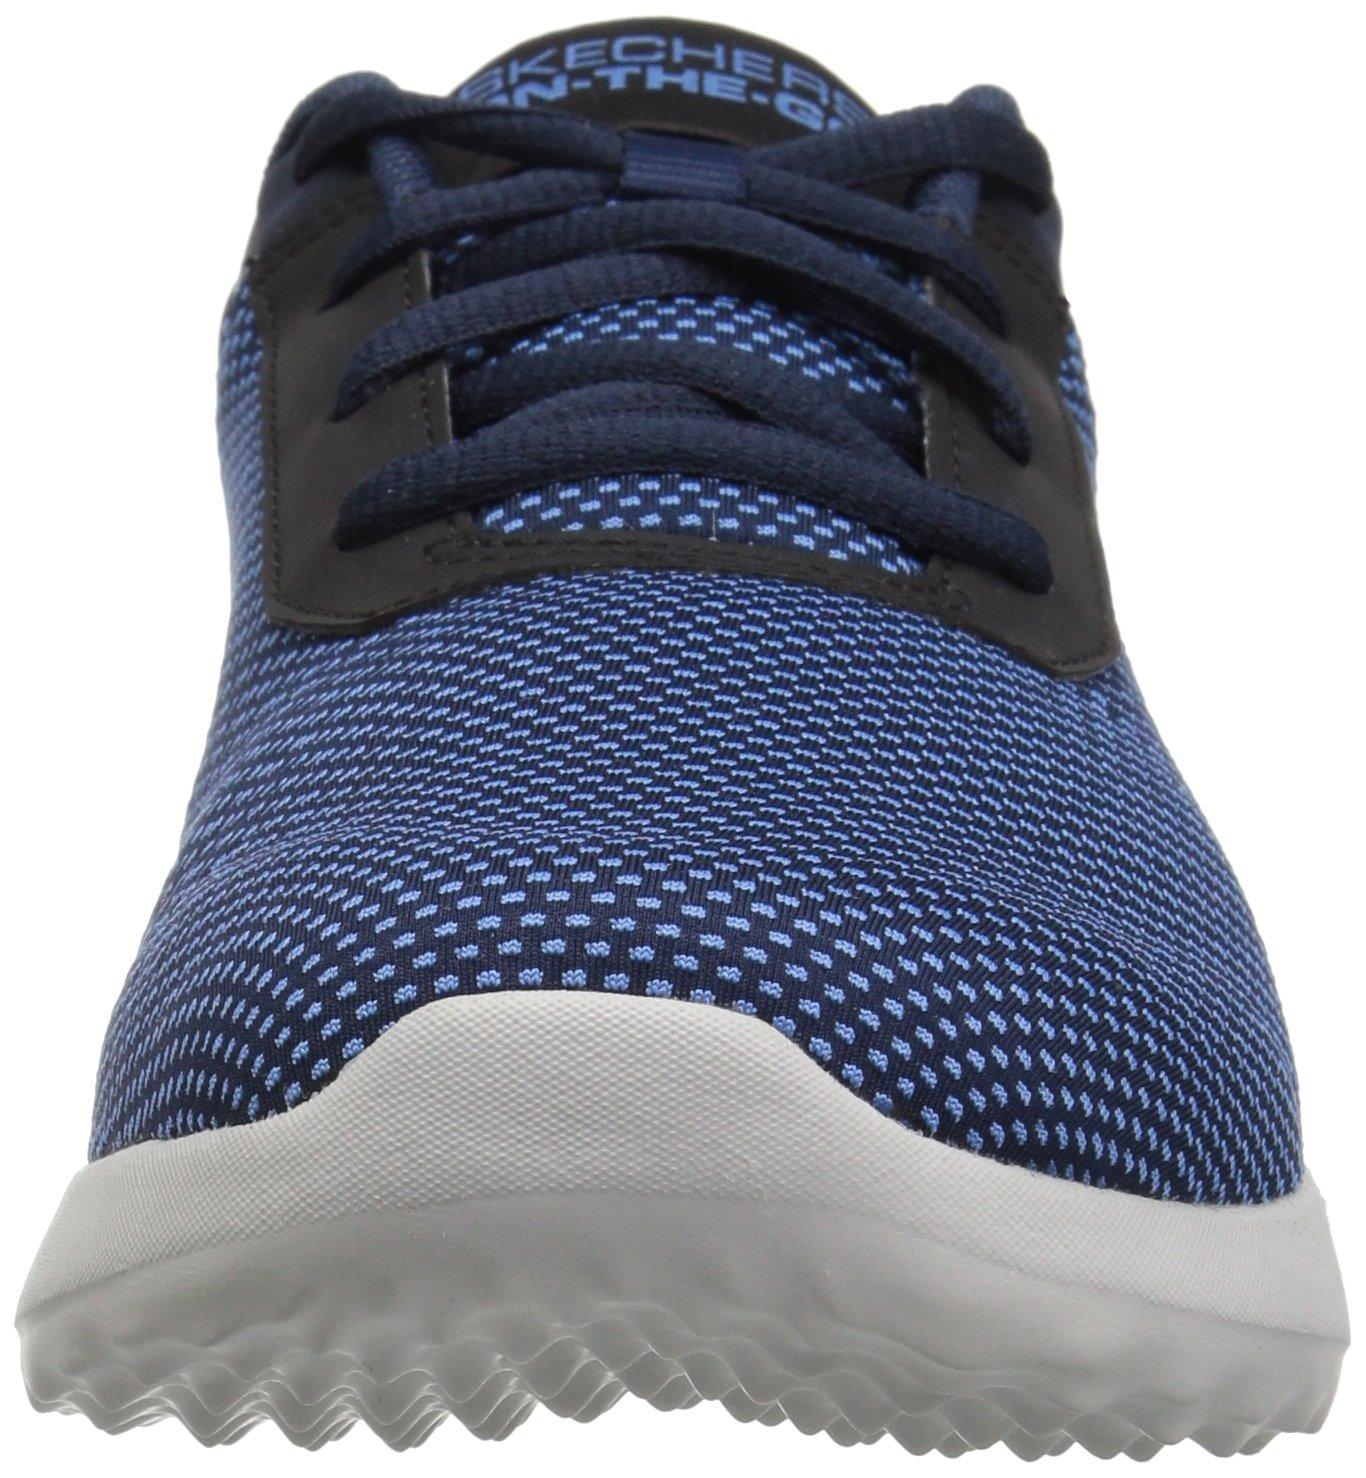 Skechers Women's on-The-Go City 3.0-Brilliance Sneaker B078GPX6GL 6.5 B(M) US|Navy/Gray